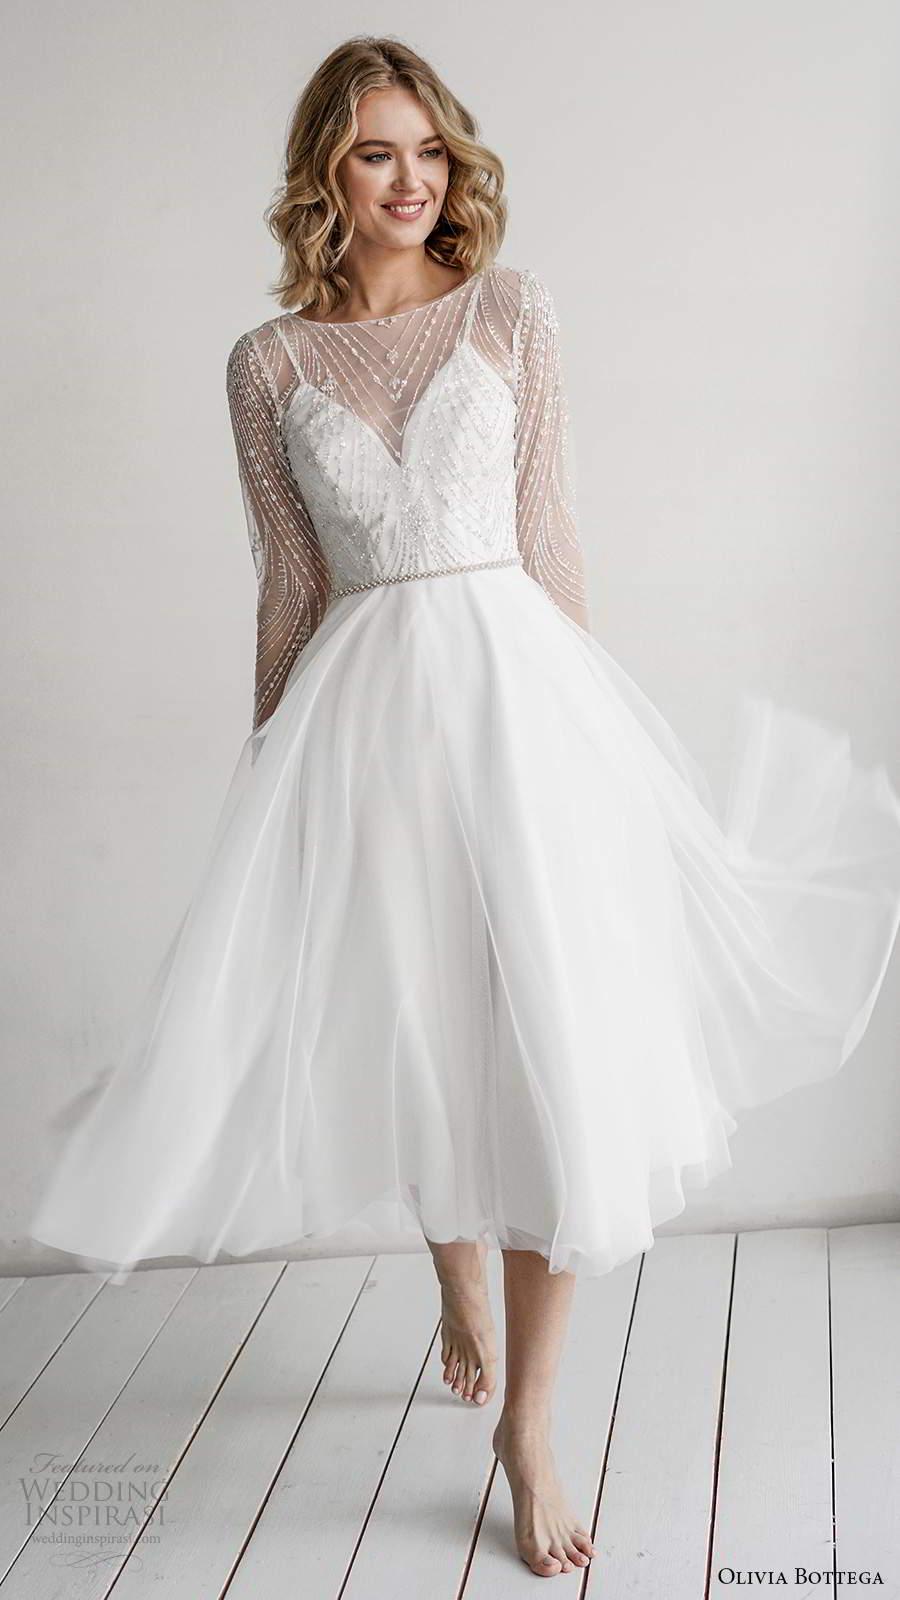 Olivia Bottega 2021 Wedding Dresses Wedding Inspirasi Modern Bridal Dress Short Wedding Gowns Knee Length Wedding Dress [ 1600 x 900 Pixel ]